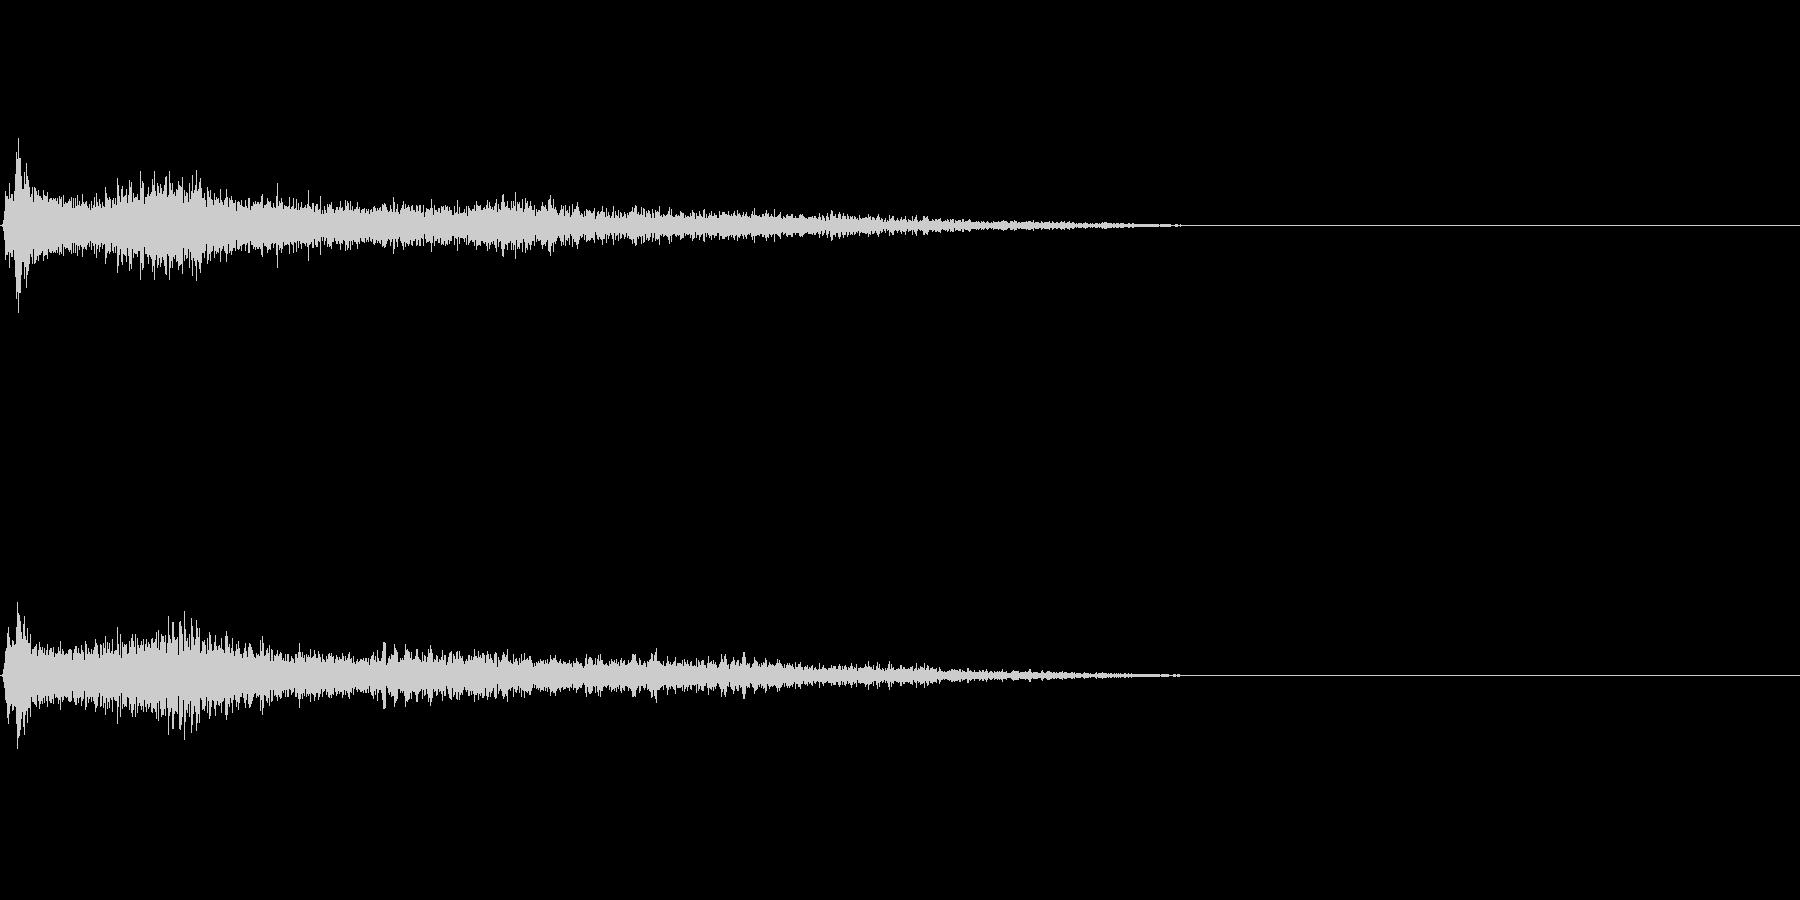 G♯マイナー インパクト音 衝撃音の未再生の波形